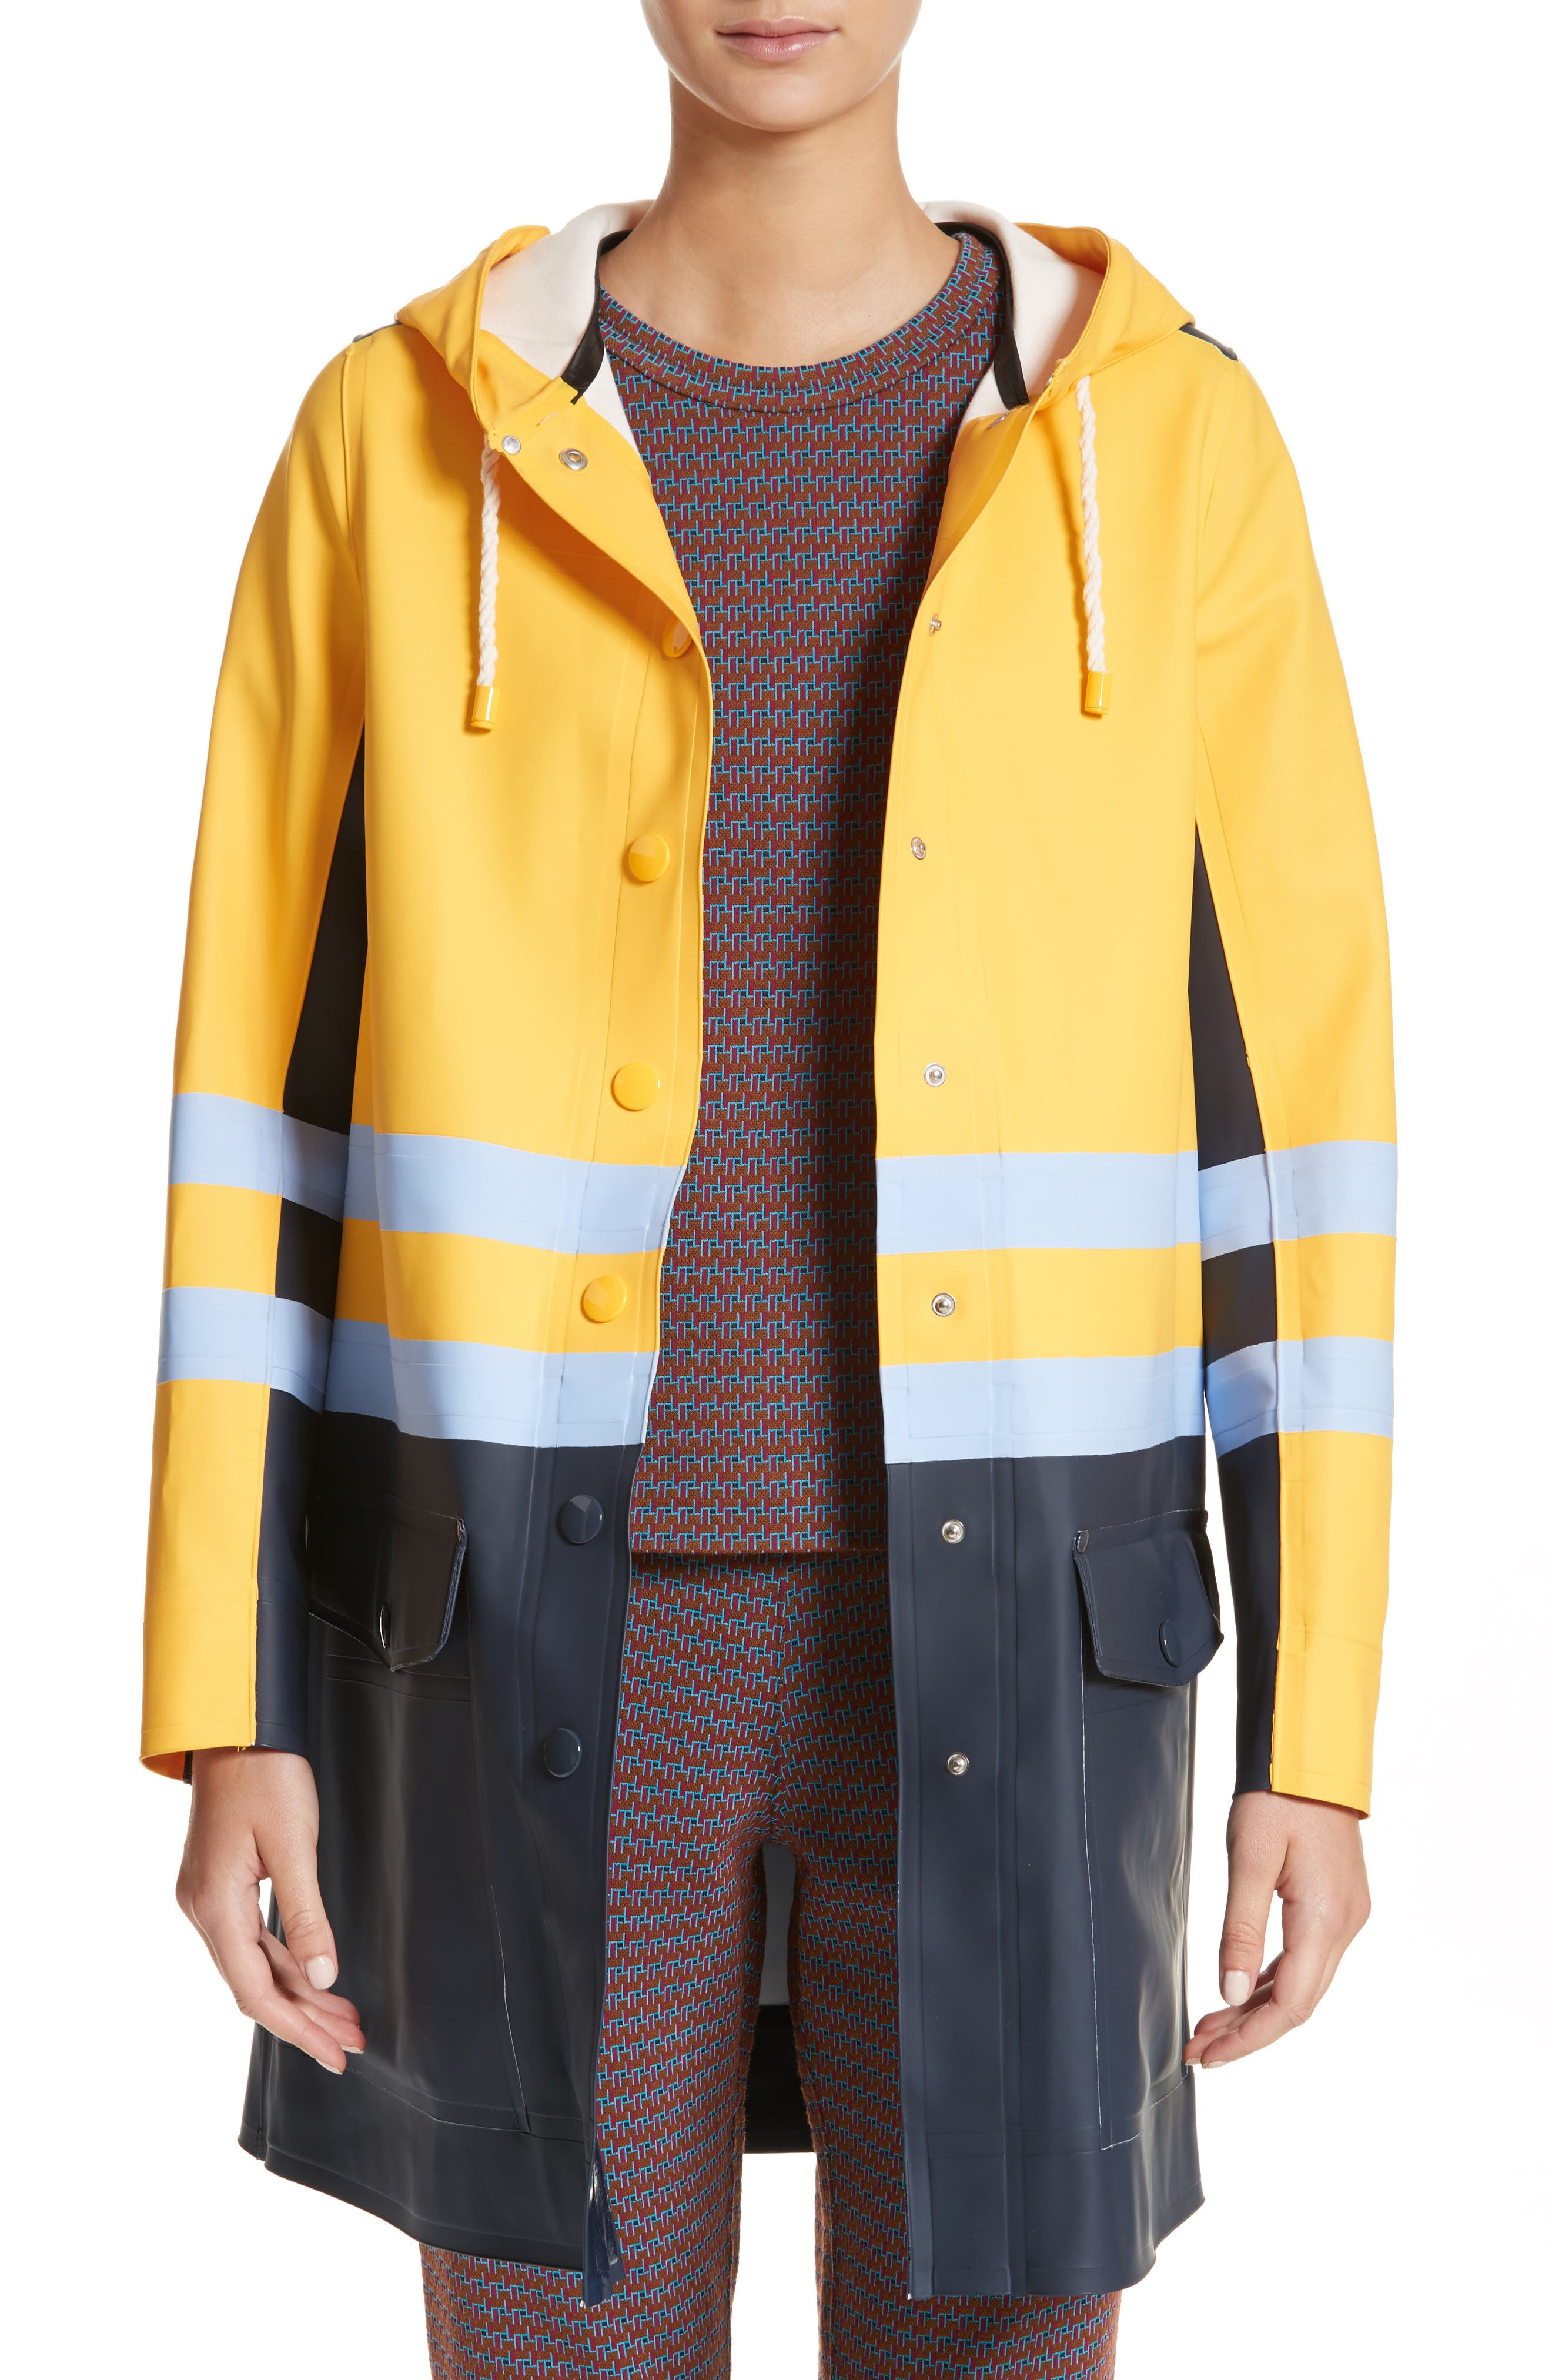 Stutterheim x Marni Waterproof Hooded Raincoat,                         Main,                         color, Iris Blue